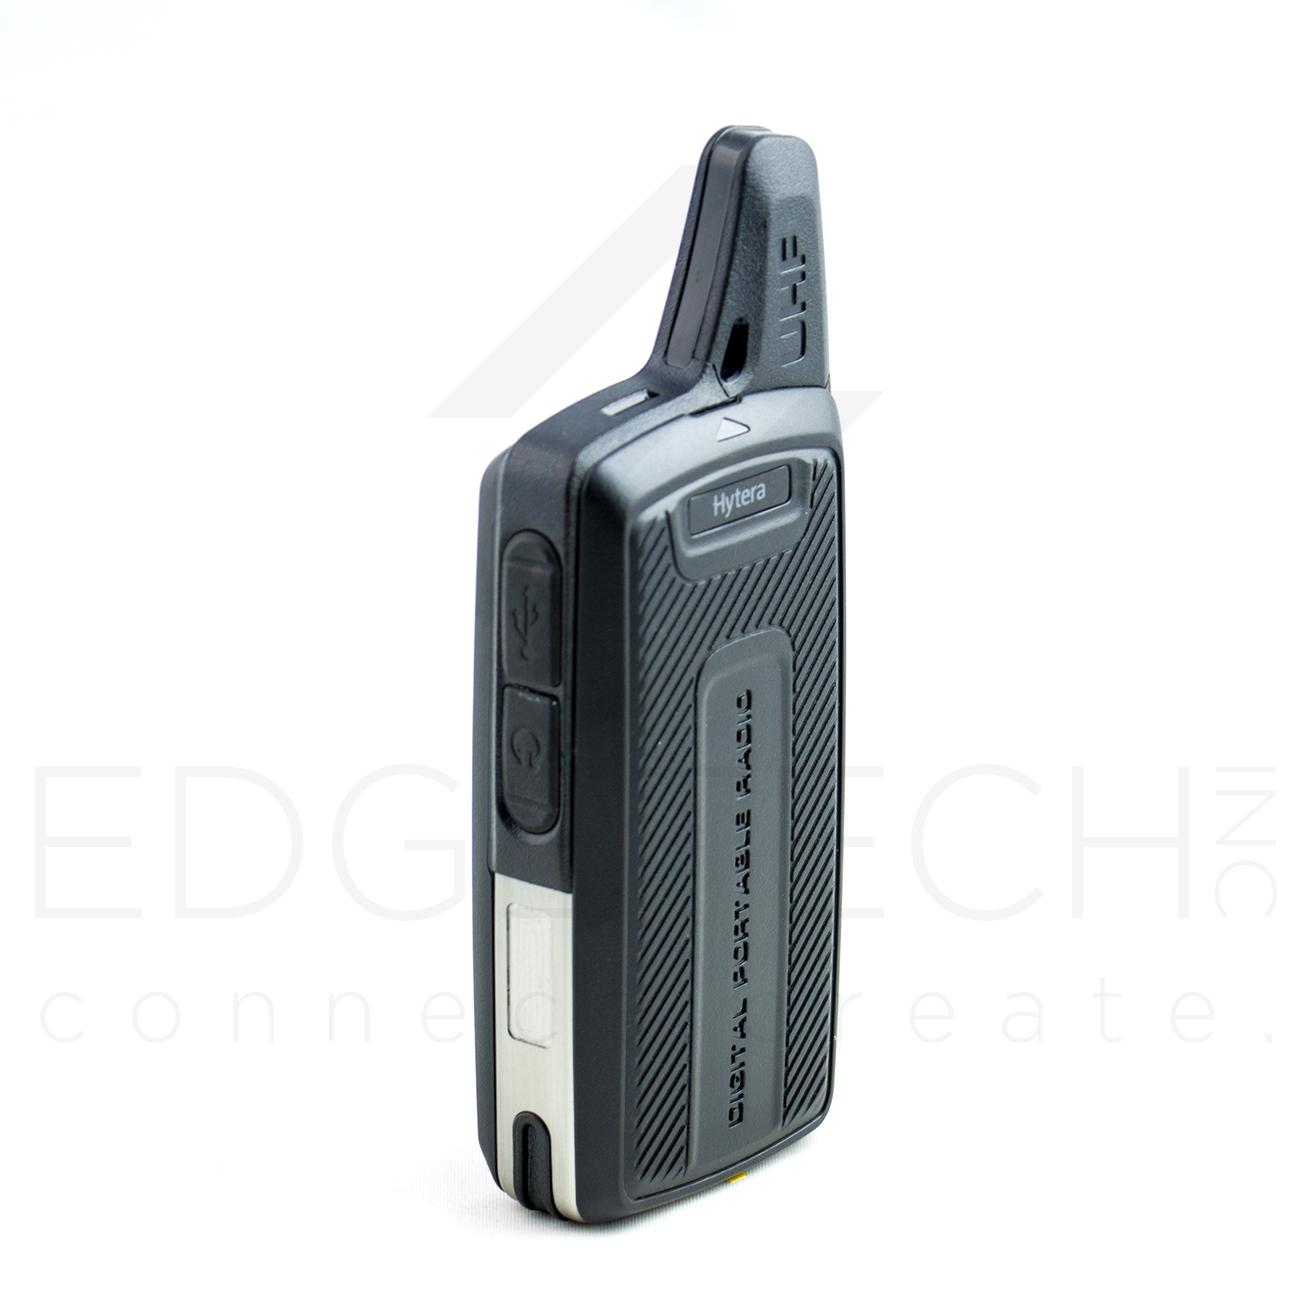 Hytera PD362iUC-W   Digital Portable Radios   EdgeTech